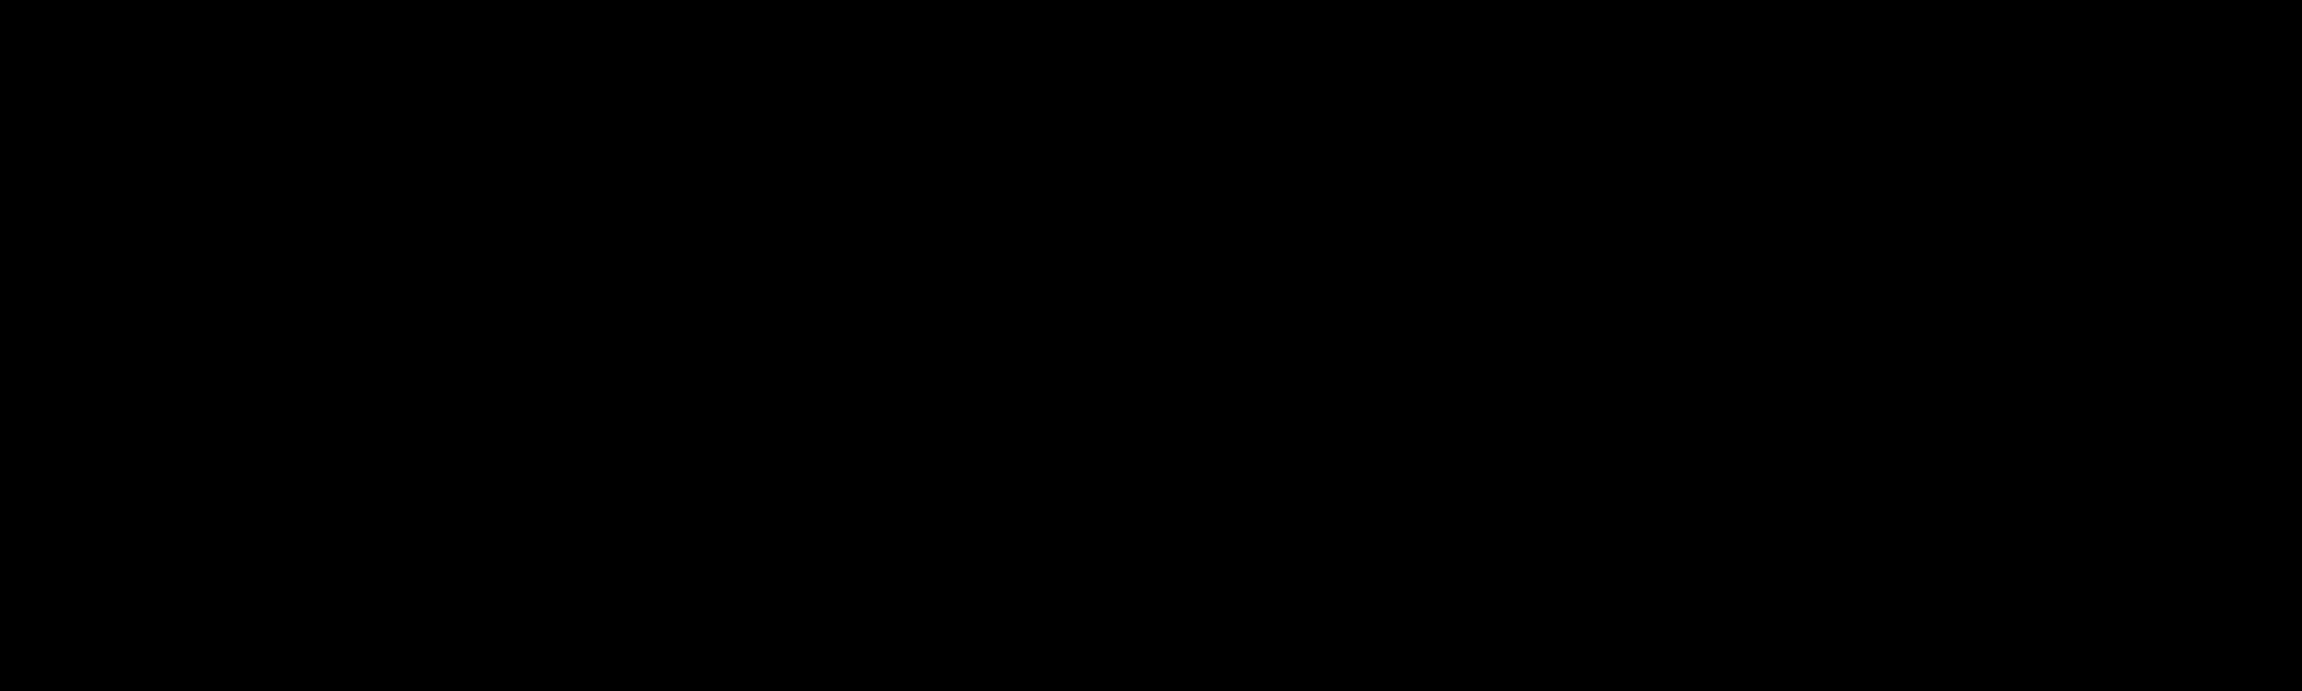 Aripiprazole N4-oxide-d<sub>8</sub> (butyl-d<sub>8</sub>)